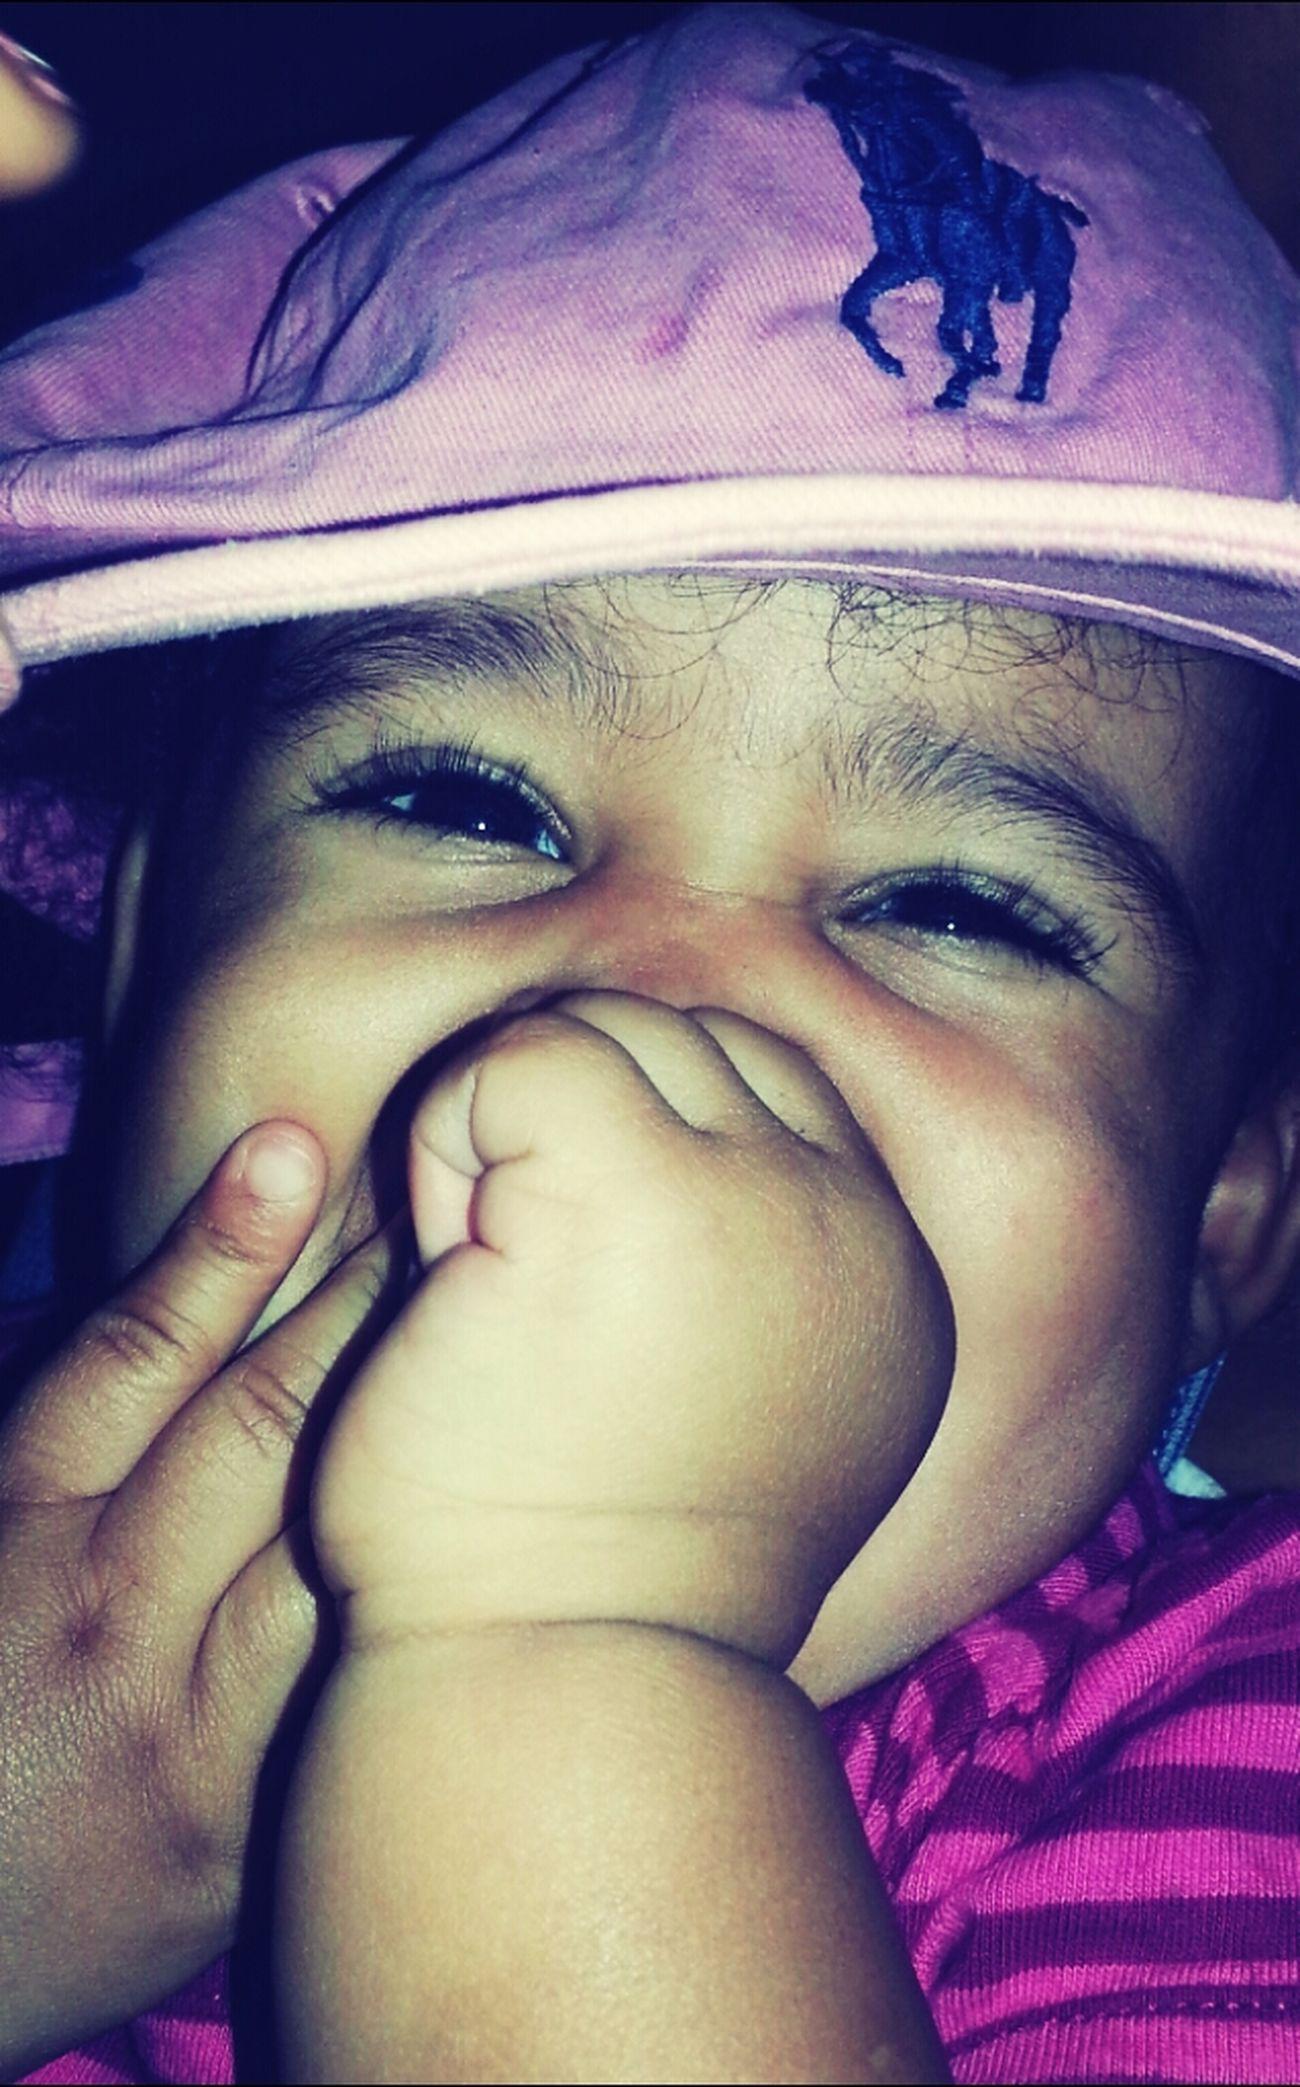 my baby cosin♥ *peep her hat.